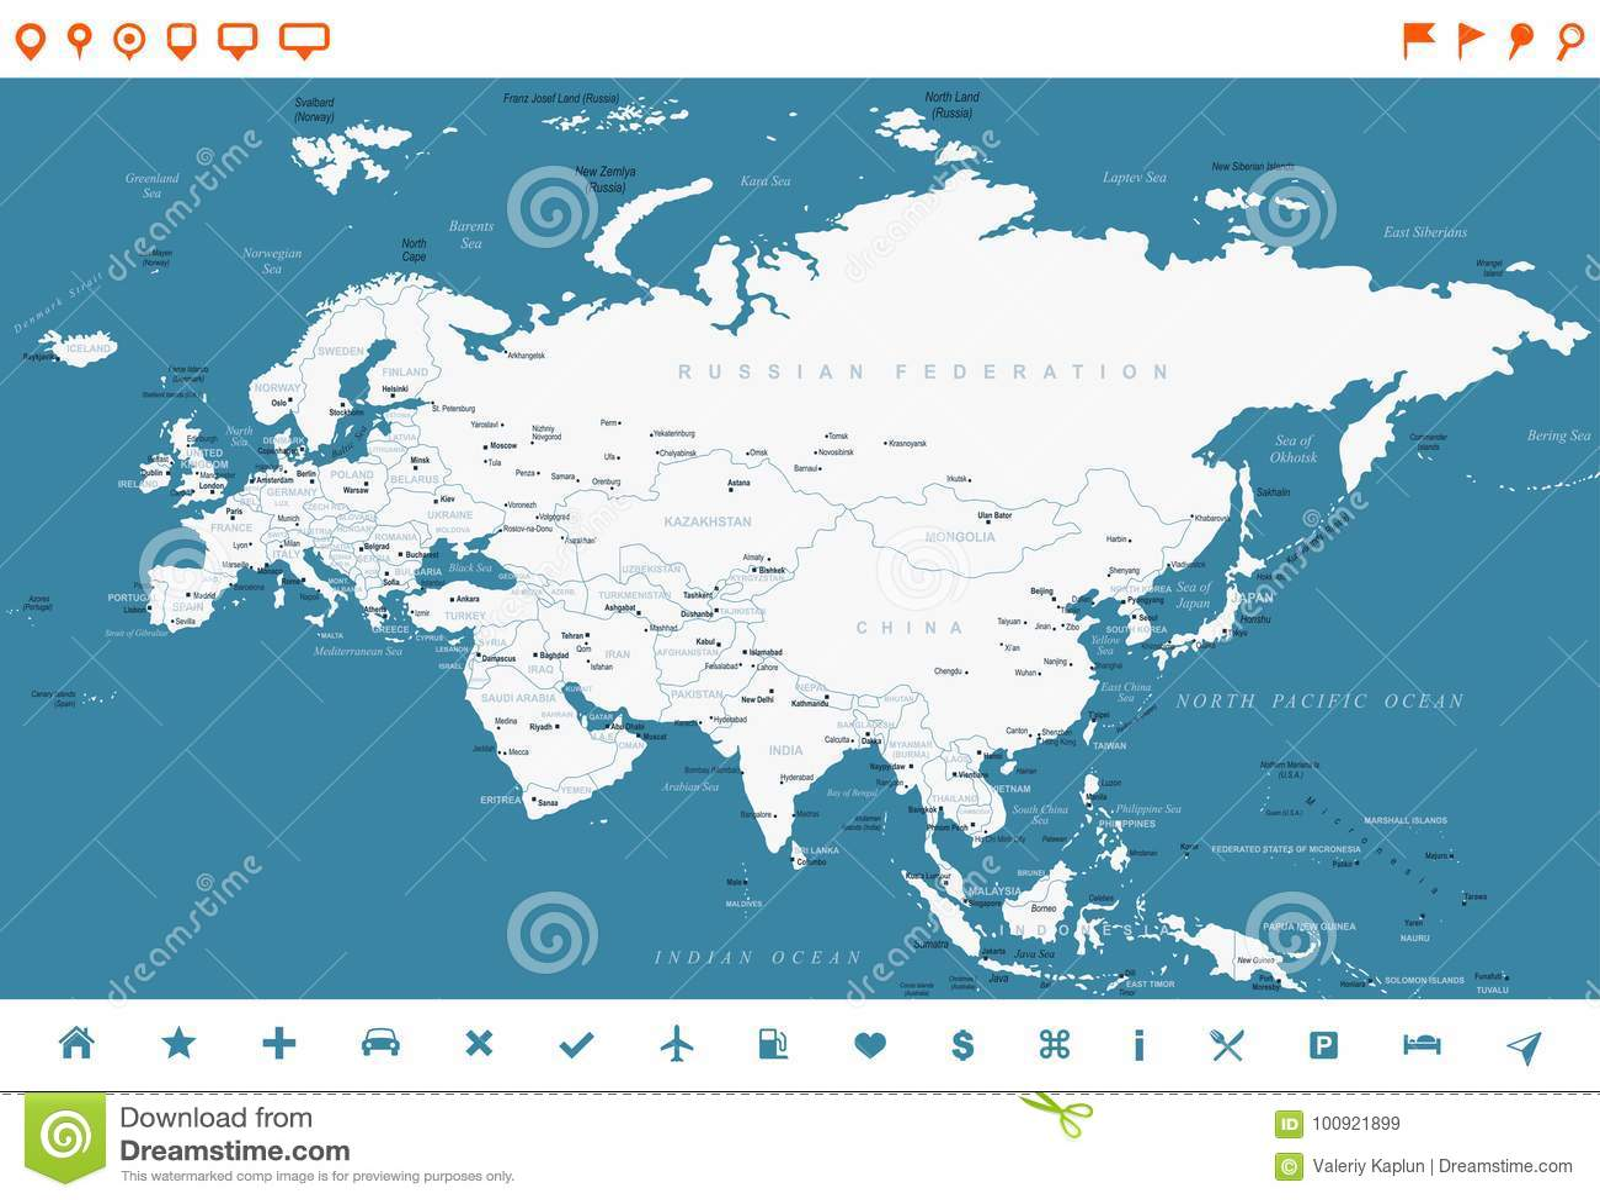 Indonesia Thailand Map.Eurasia Europa Russia China India Indonesia Thailand Map Vector